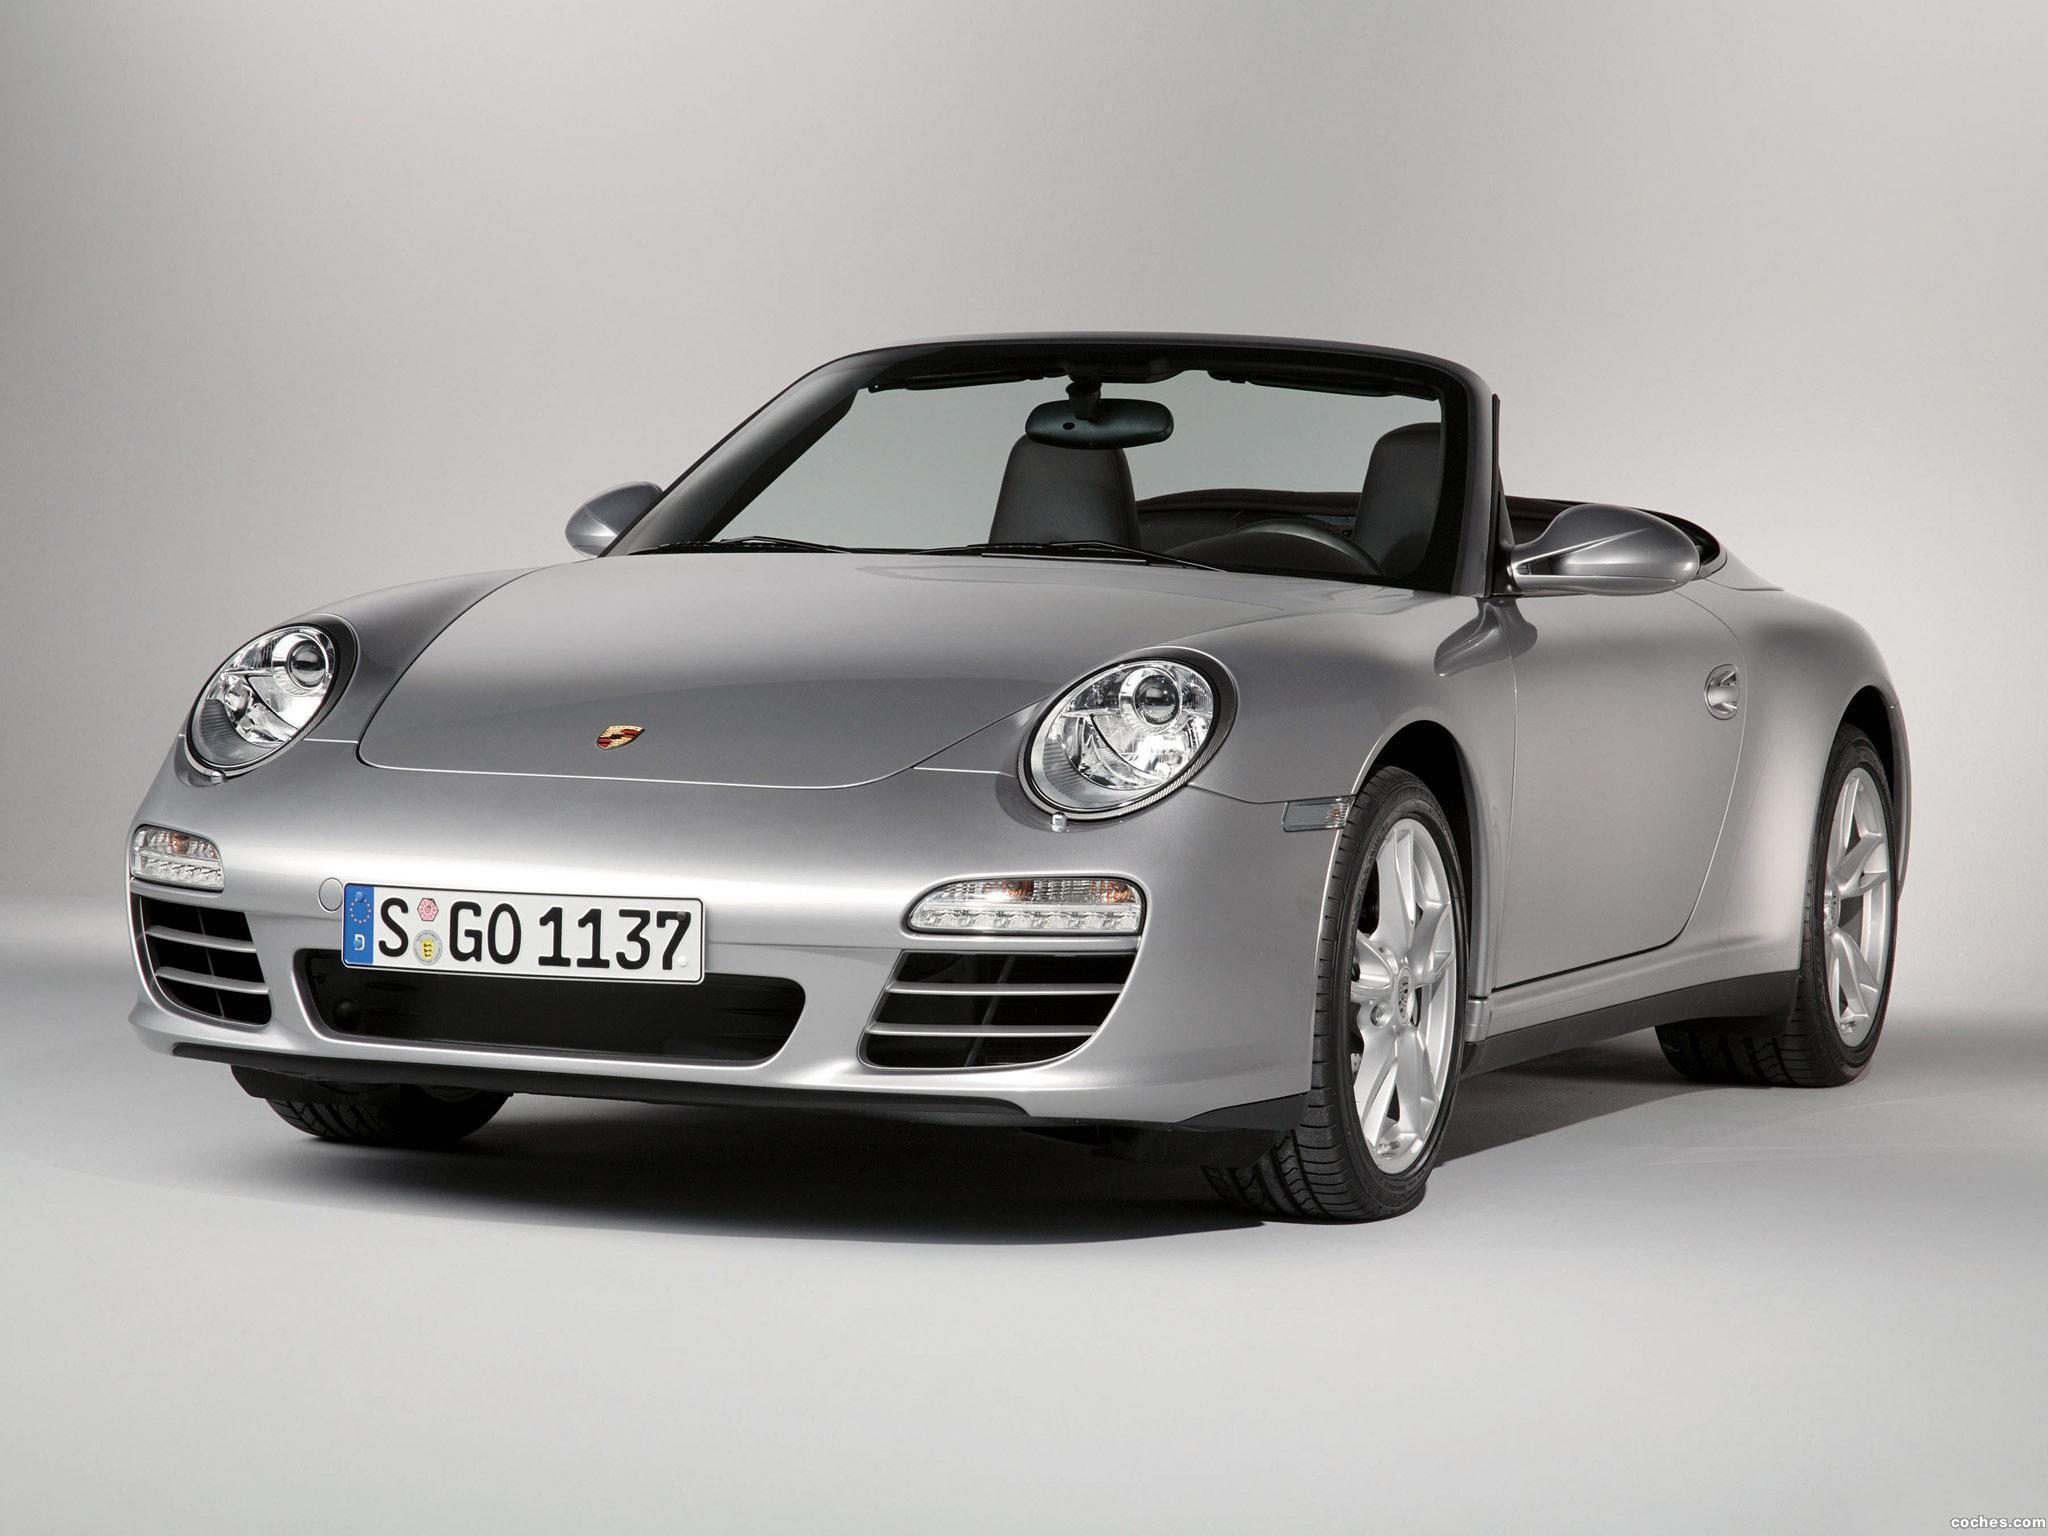 porsche_911-carrera-4-cabriolet-997-2008_r8.jpg